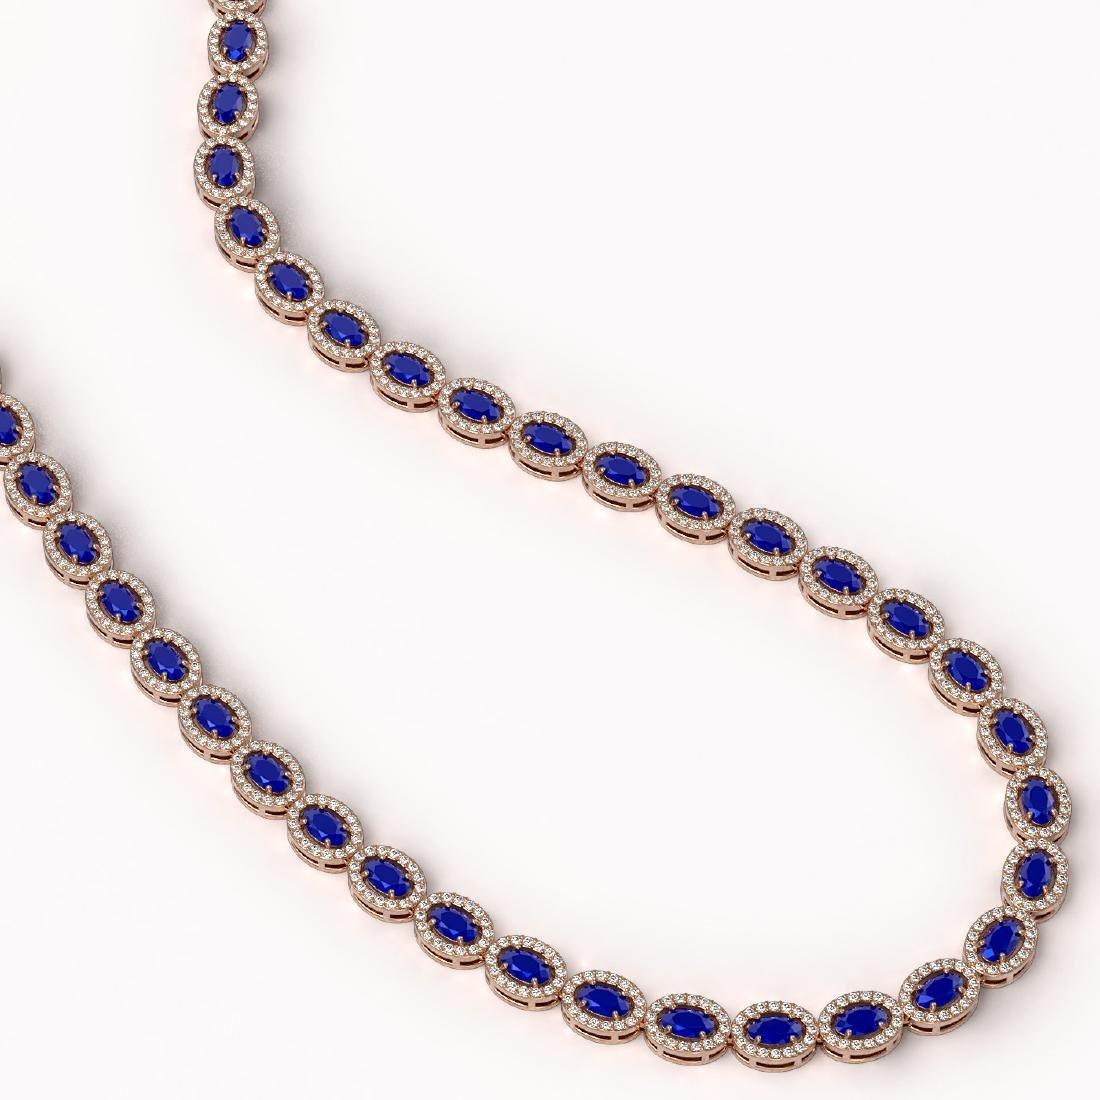 26.38 CTW Sapphire & Diamond Halo Necklace 10K Rose - 2